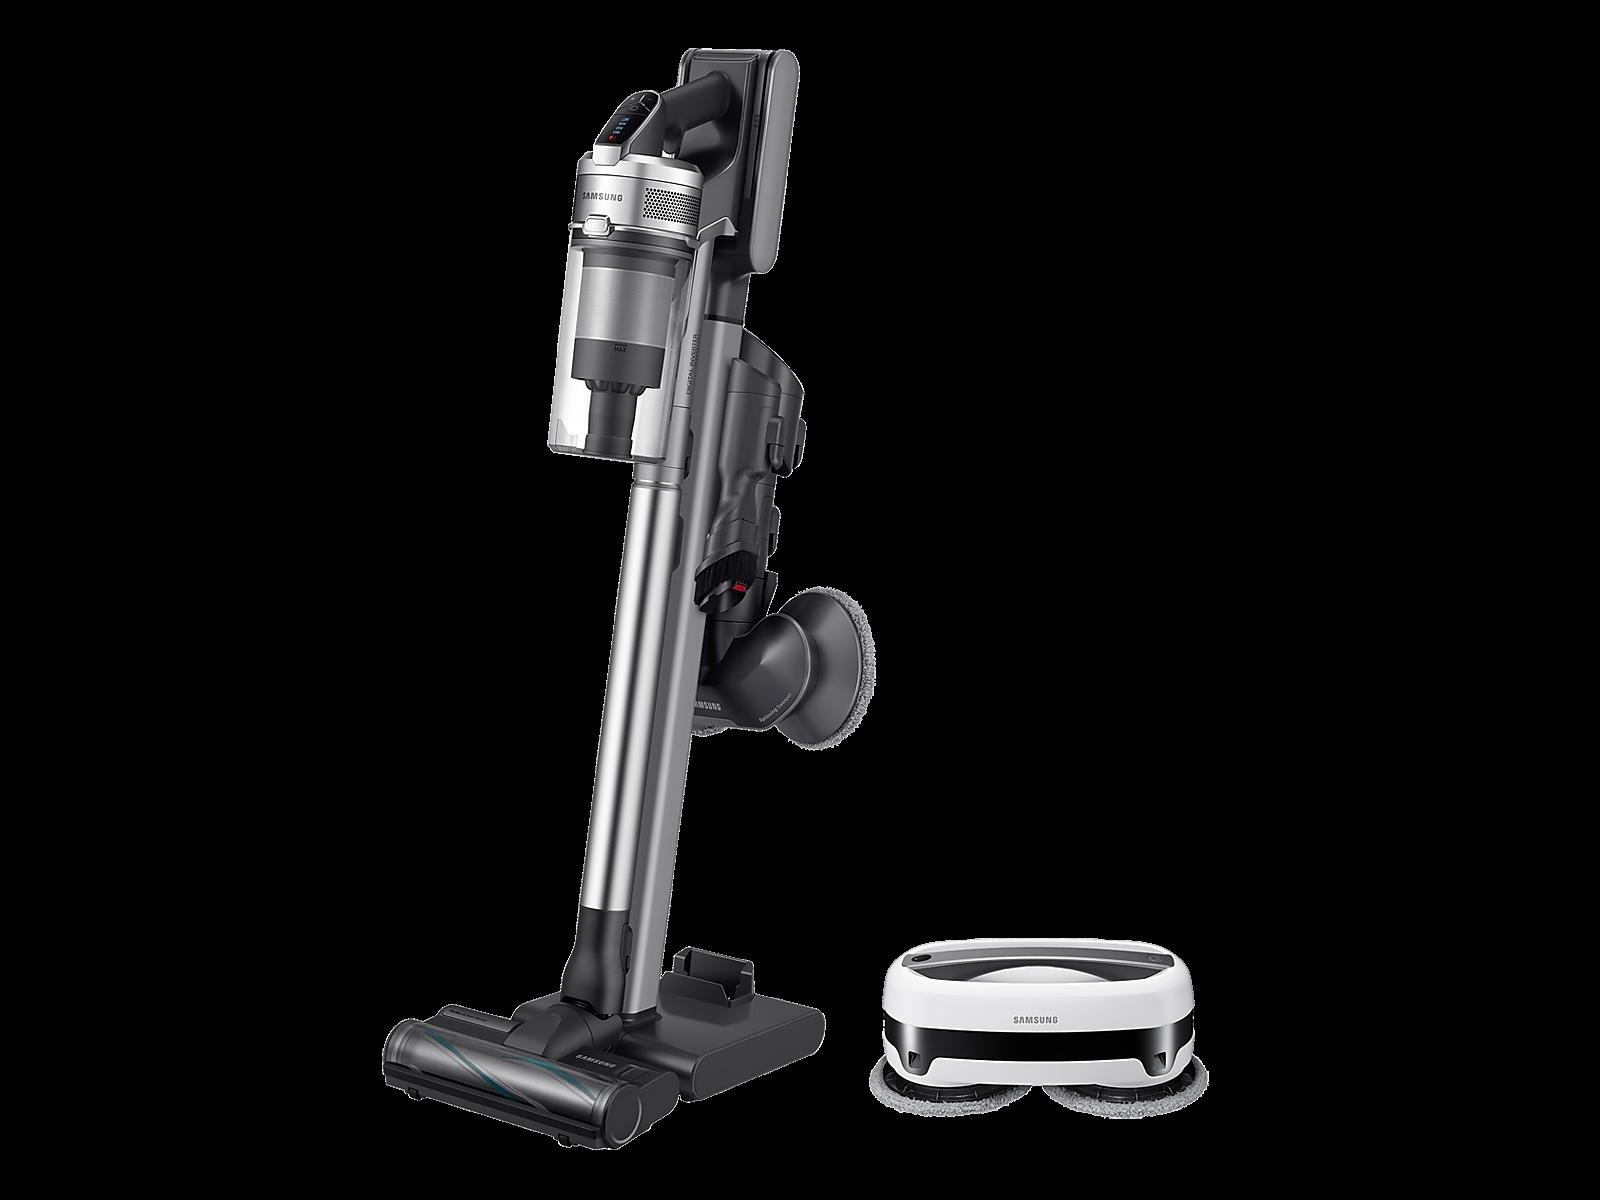 Samsung coupon: Samsung Jet 90 Cordless Stick Vacuum with Jetbot Mop Cleaner Home Bundle(BNDL-1611089445533)